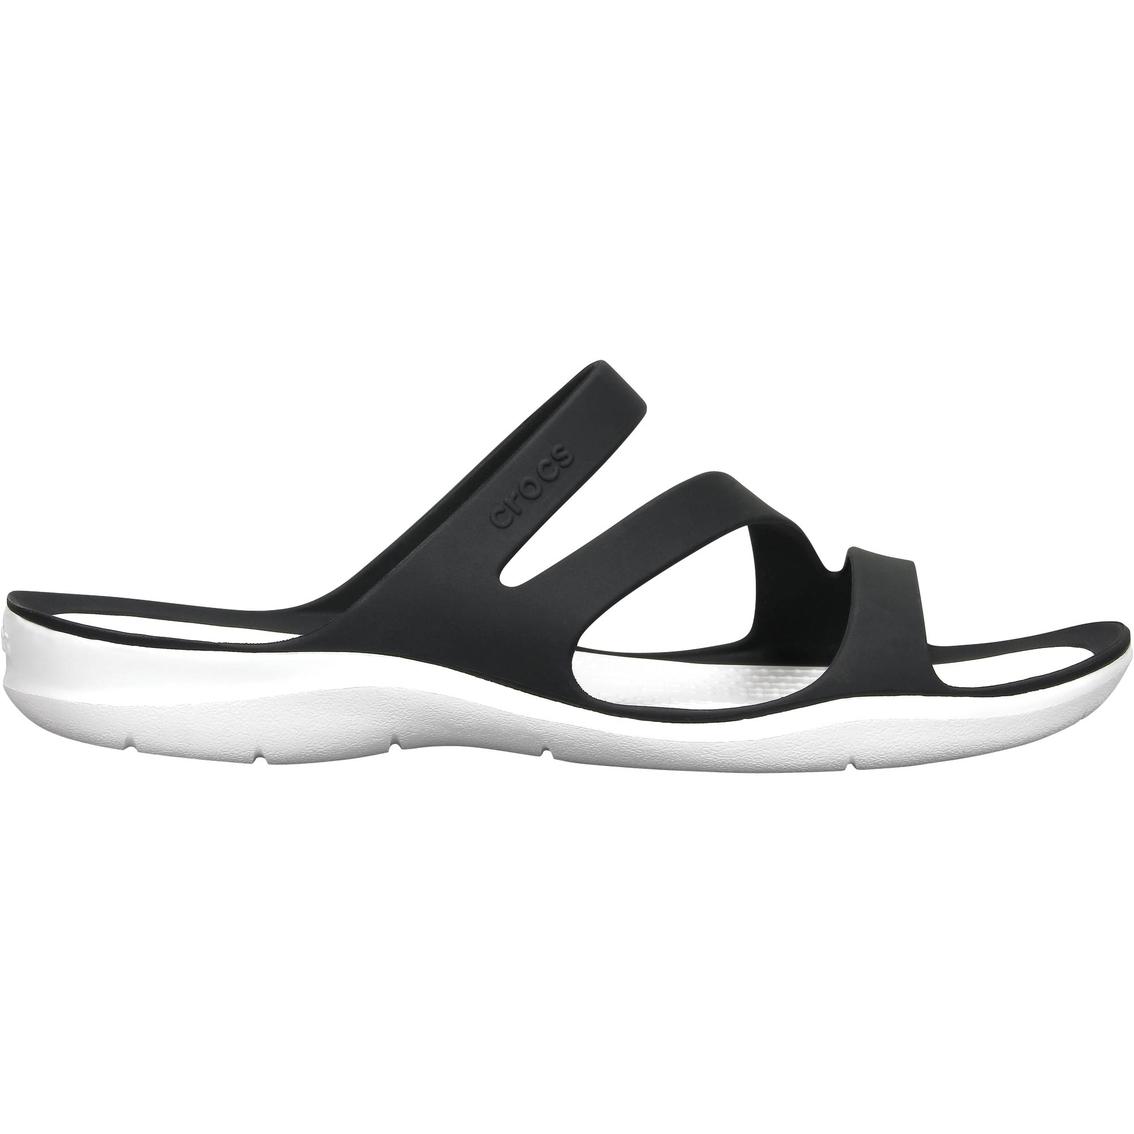 ec400a6ae426f Crocs Swiftwater Women s Sandals